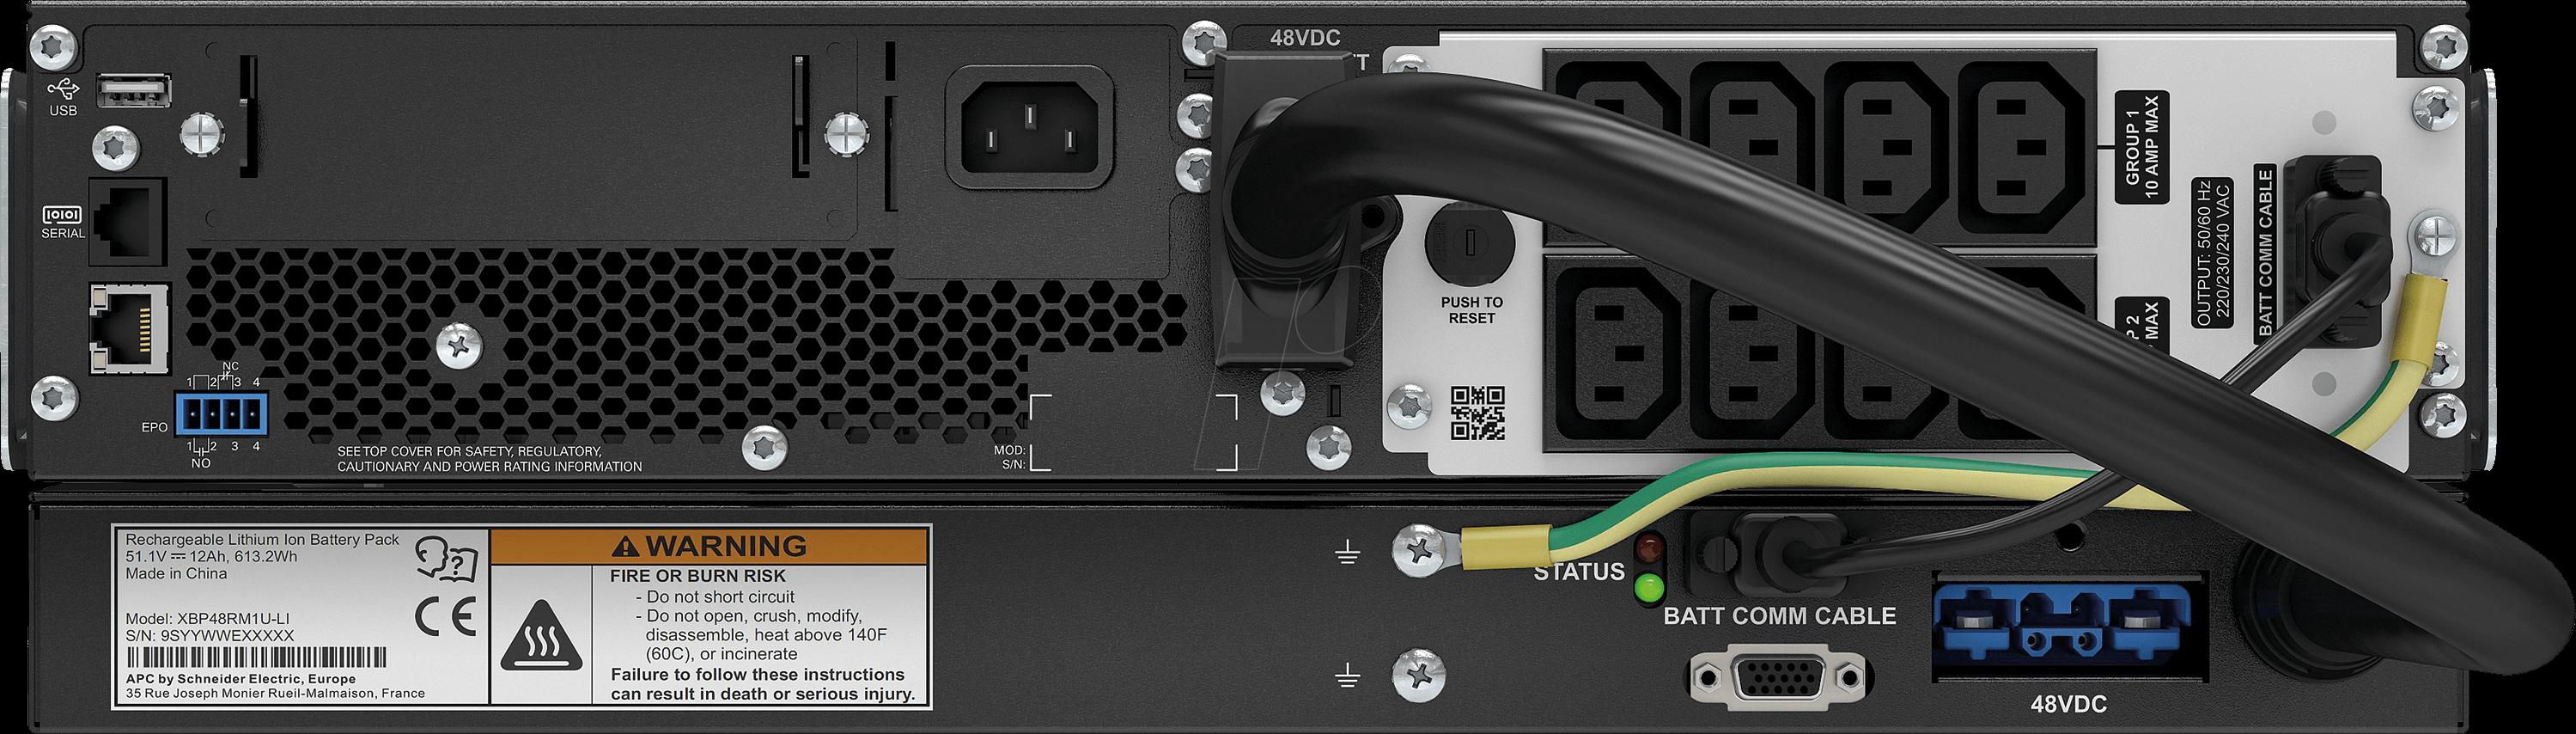 APC SRTL1000RNIC - Smart UPS, Li-Ion, 900 W/1000 VA, 230 V, 4 outputs